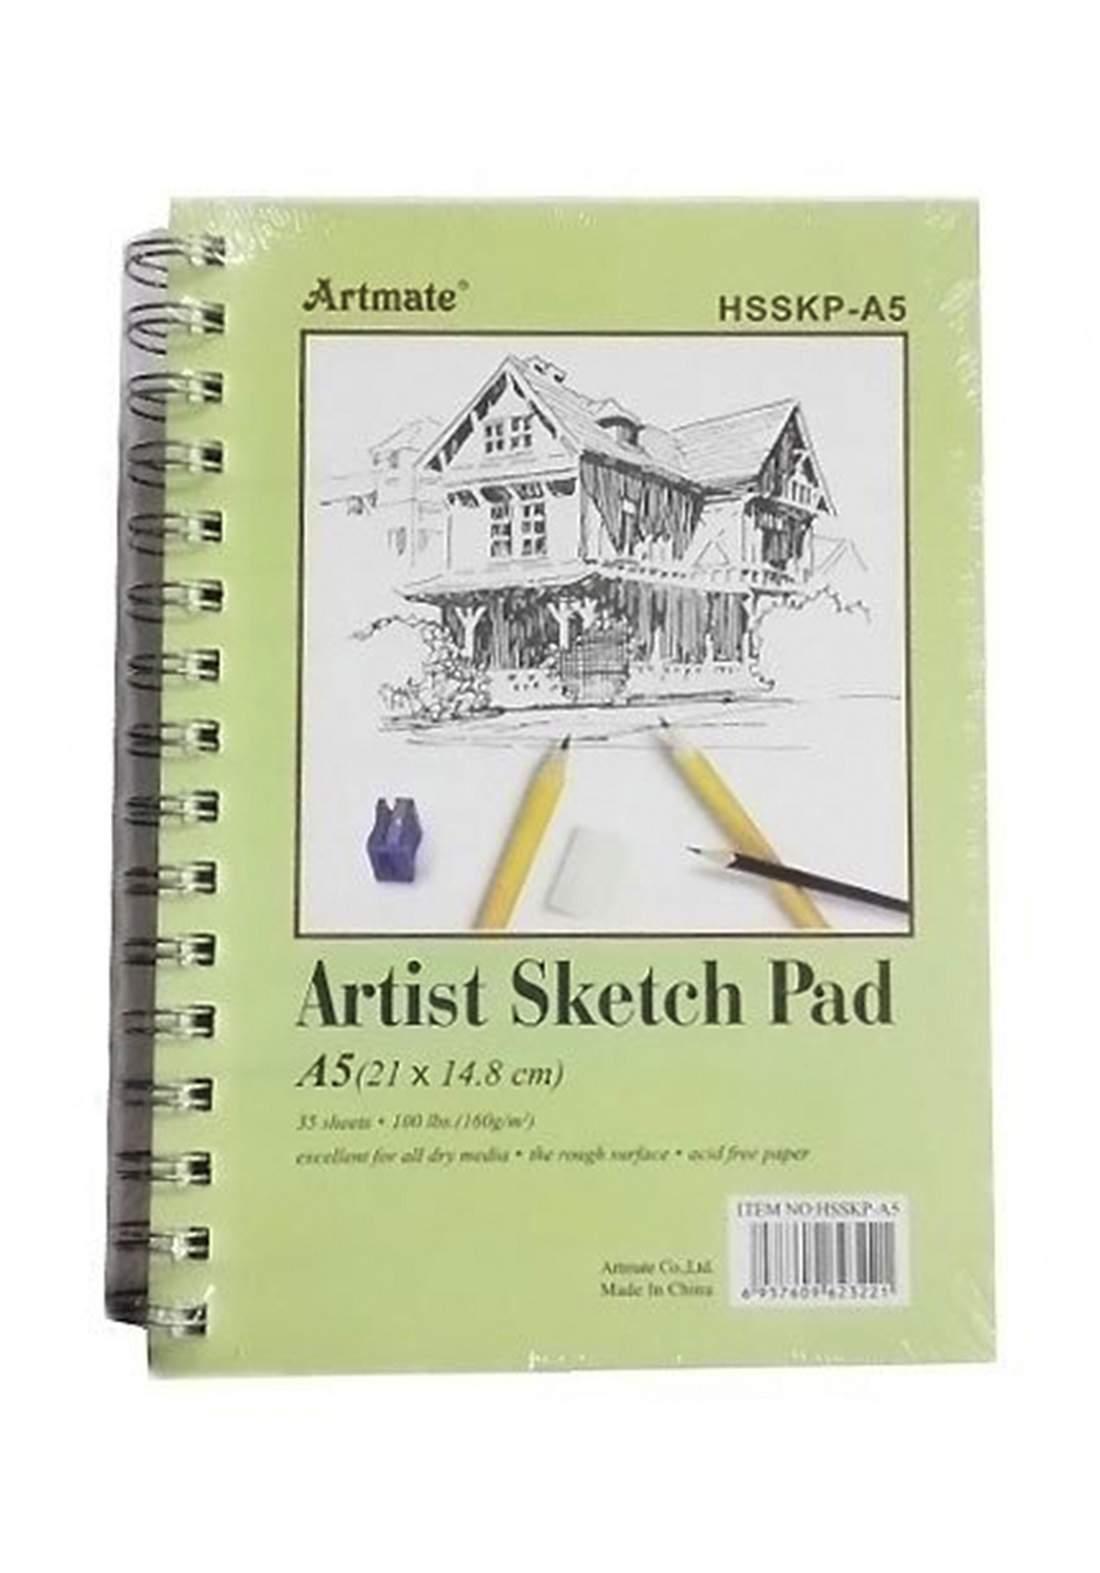 Artist Sketch Pad ( 21X14.8cm) 35 Sheets A5 160g -  دفتر رسم  35 ورقة